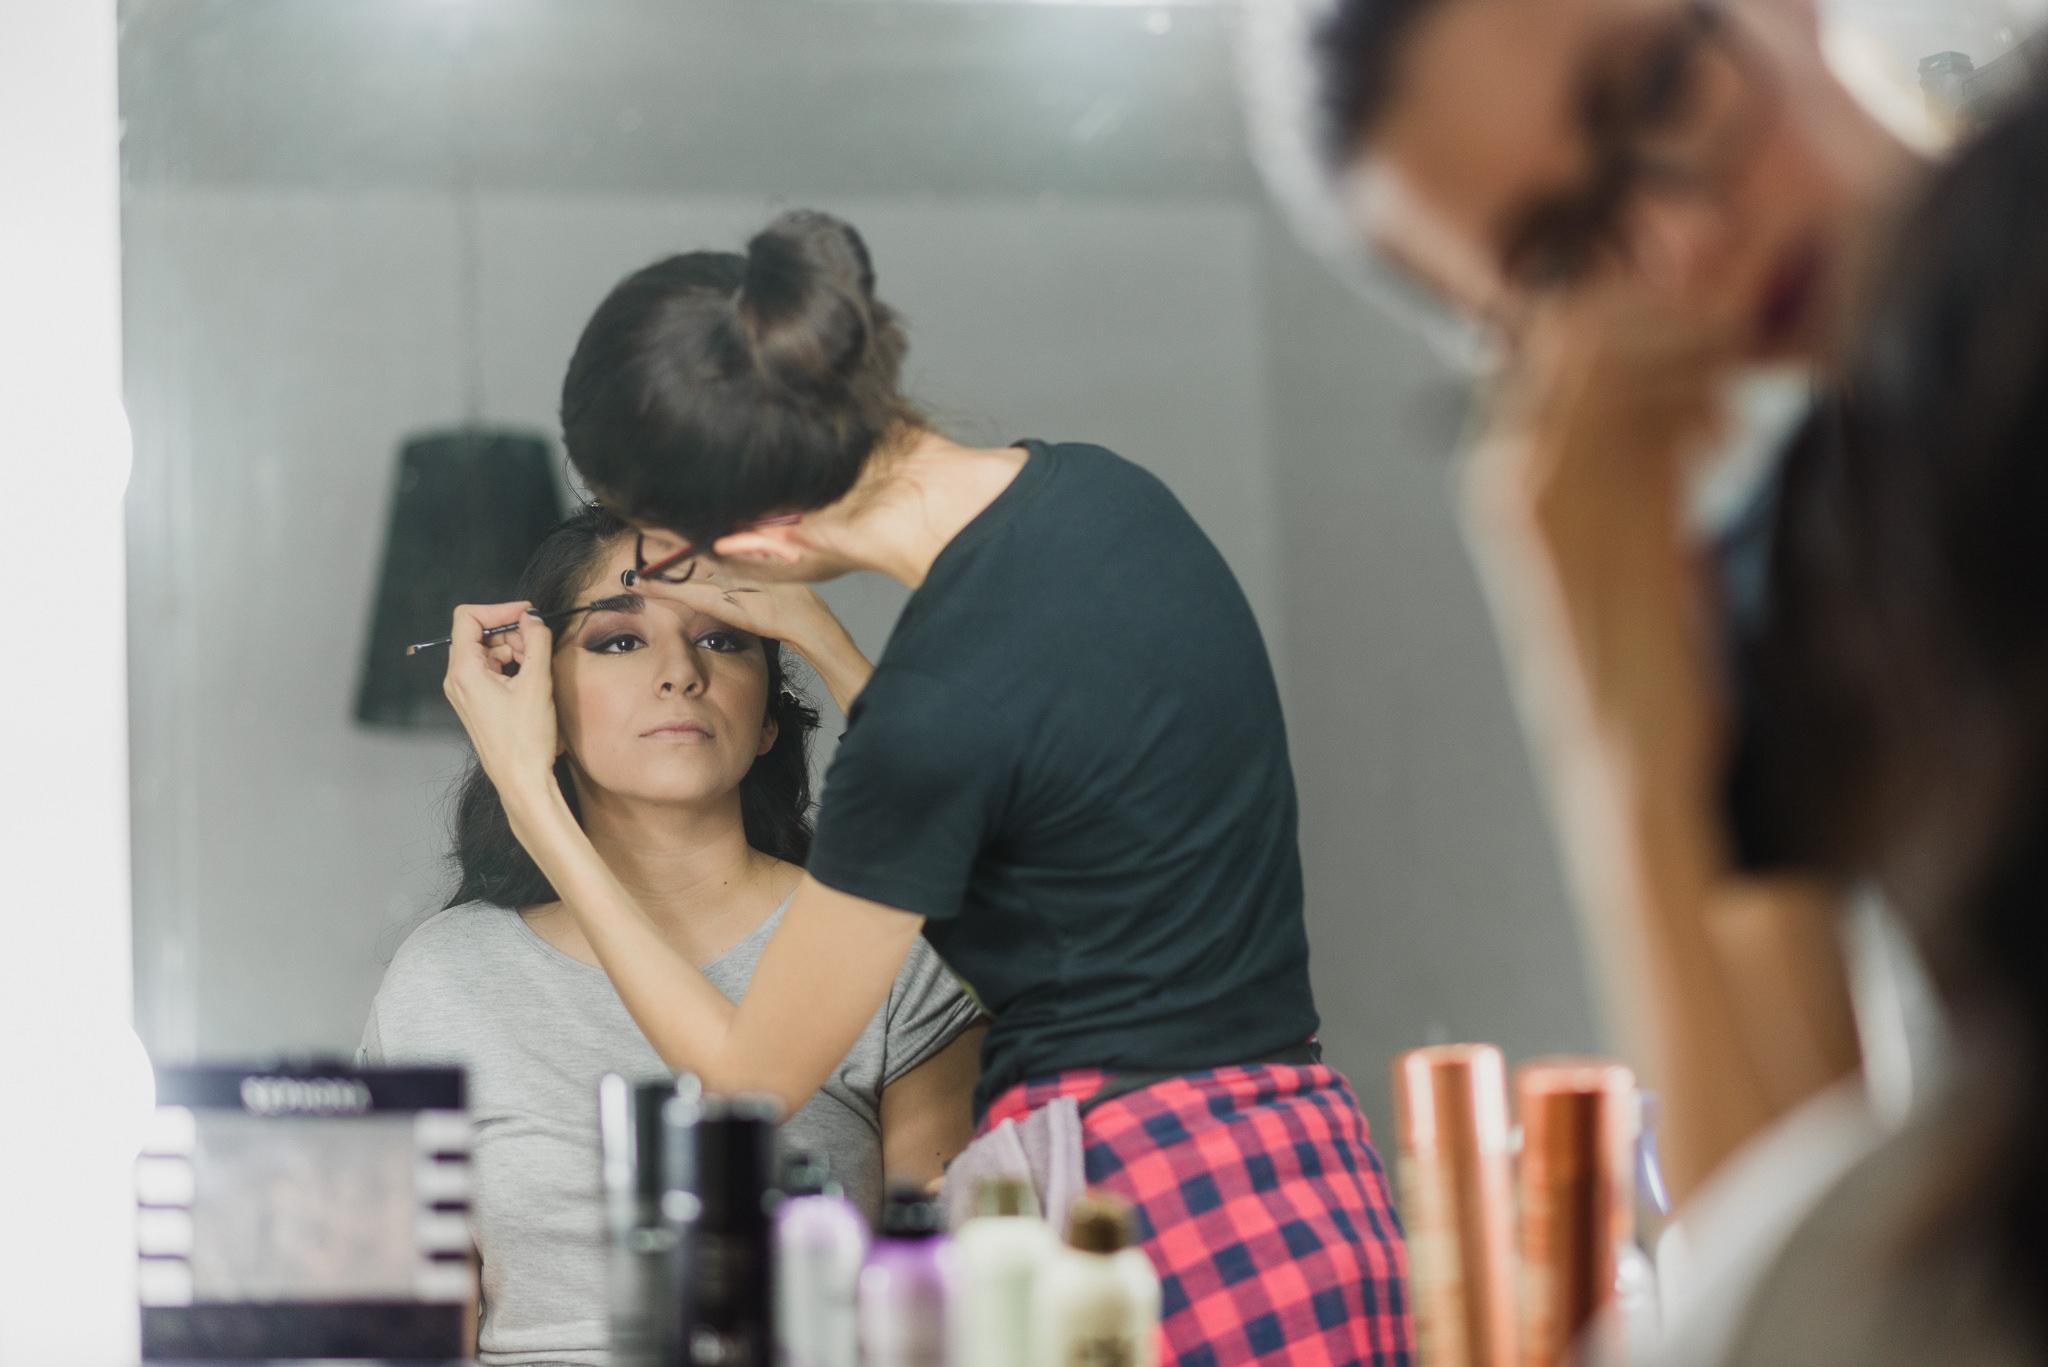 Melissa-Alcantar-Fotografia-Sesion-fotos-mexicali-retrato-